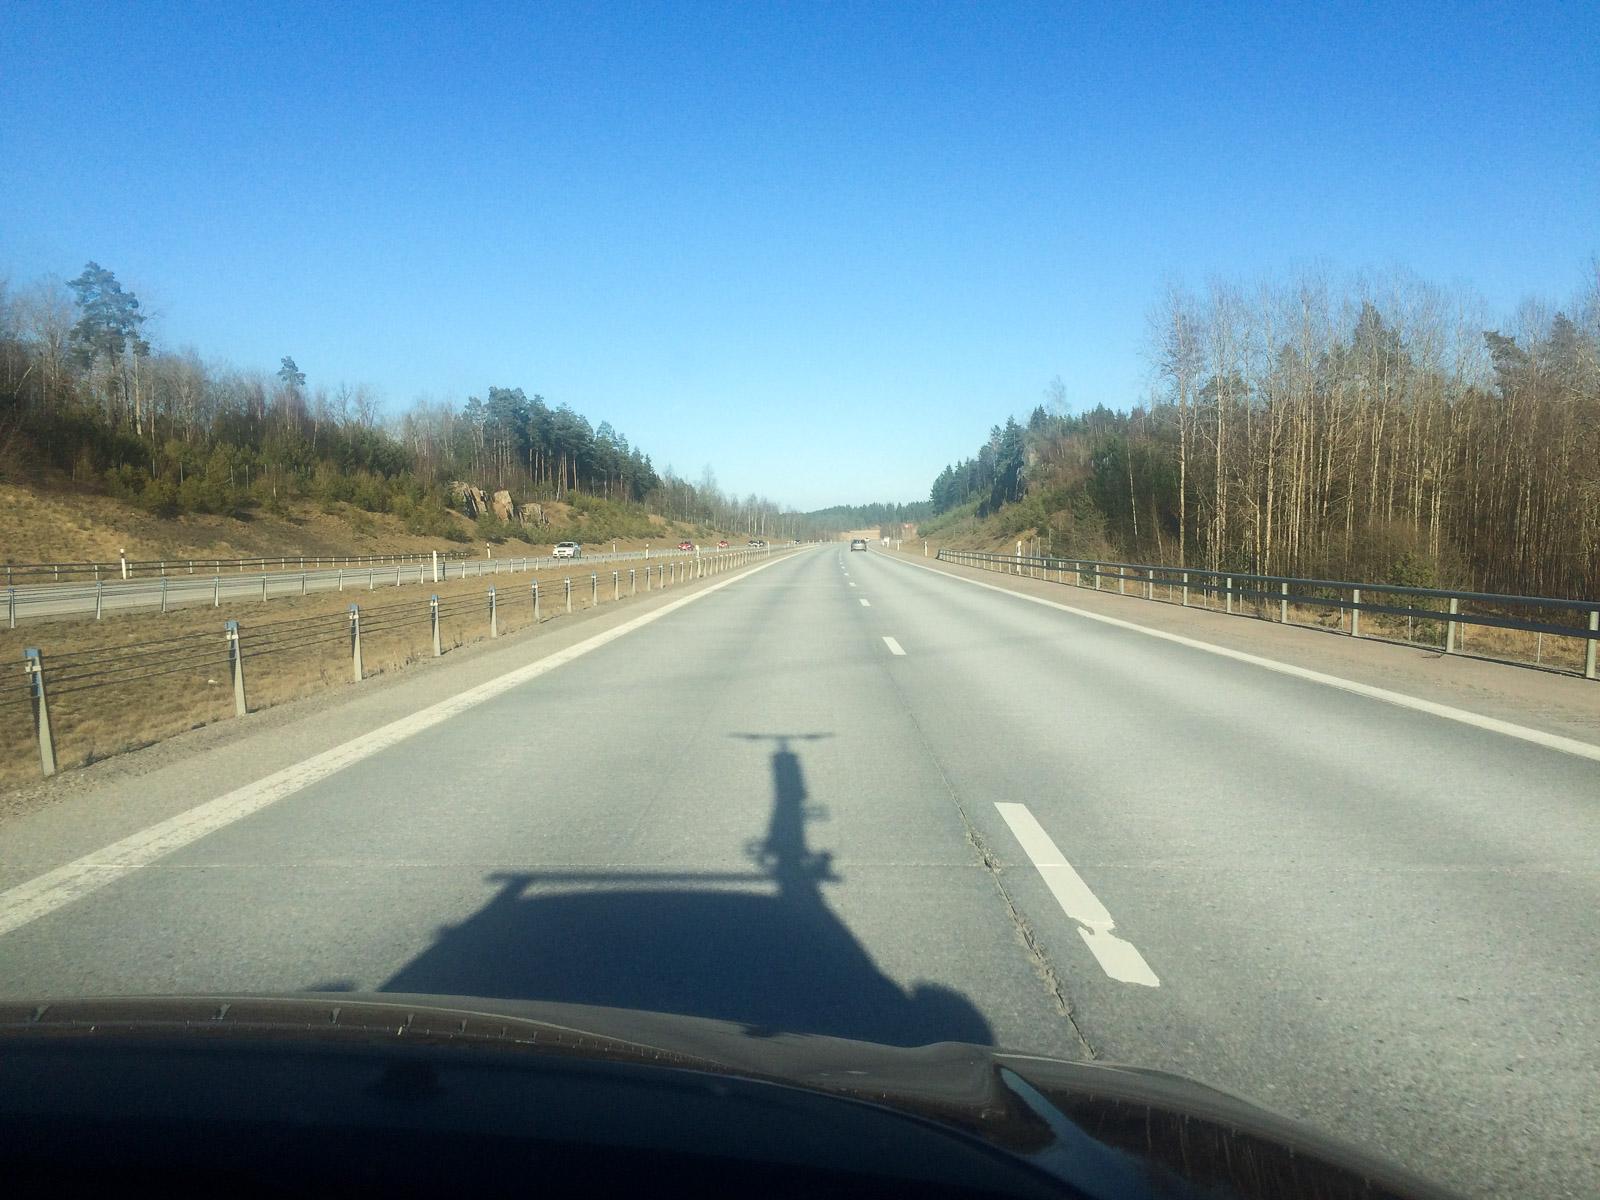 Testbanan - 3000 km landsväg.